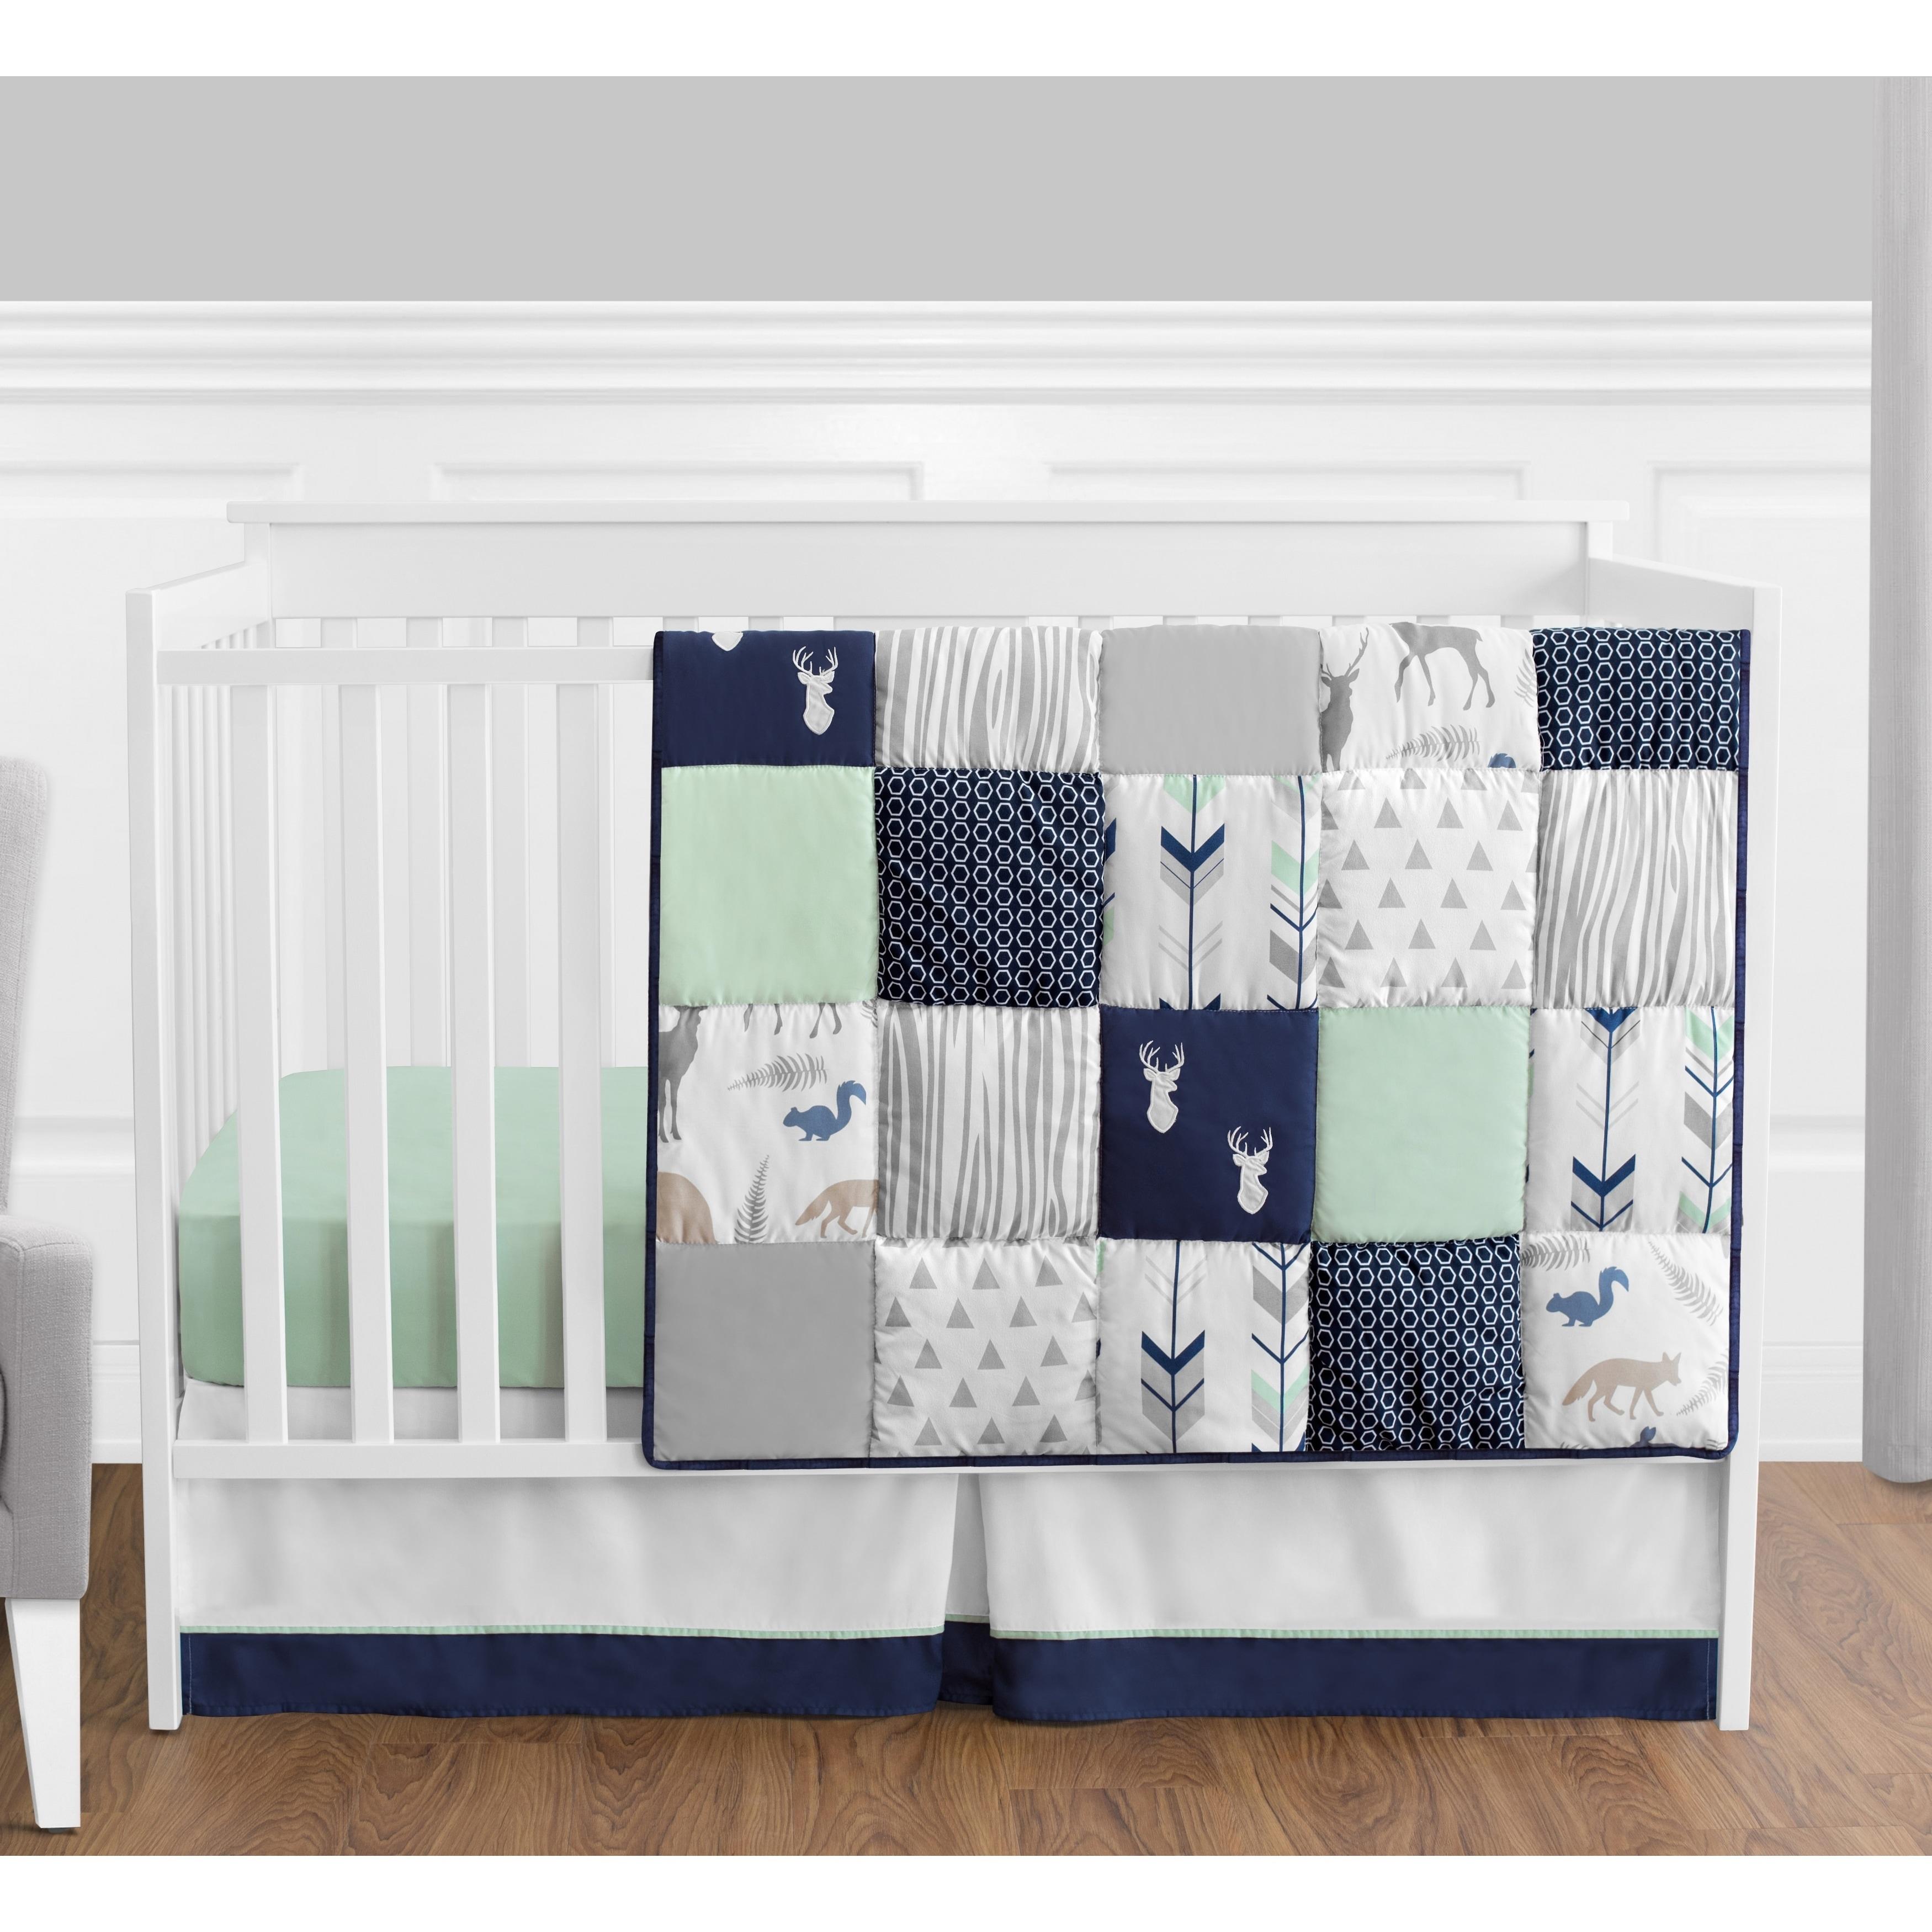 crib com sweet chevron baby bedroom gray canada cribs and nursery exciting grey set mint walmart australia piece astounding sets jojo pink bedding designs girl coral